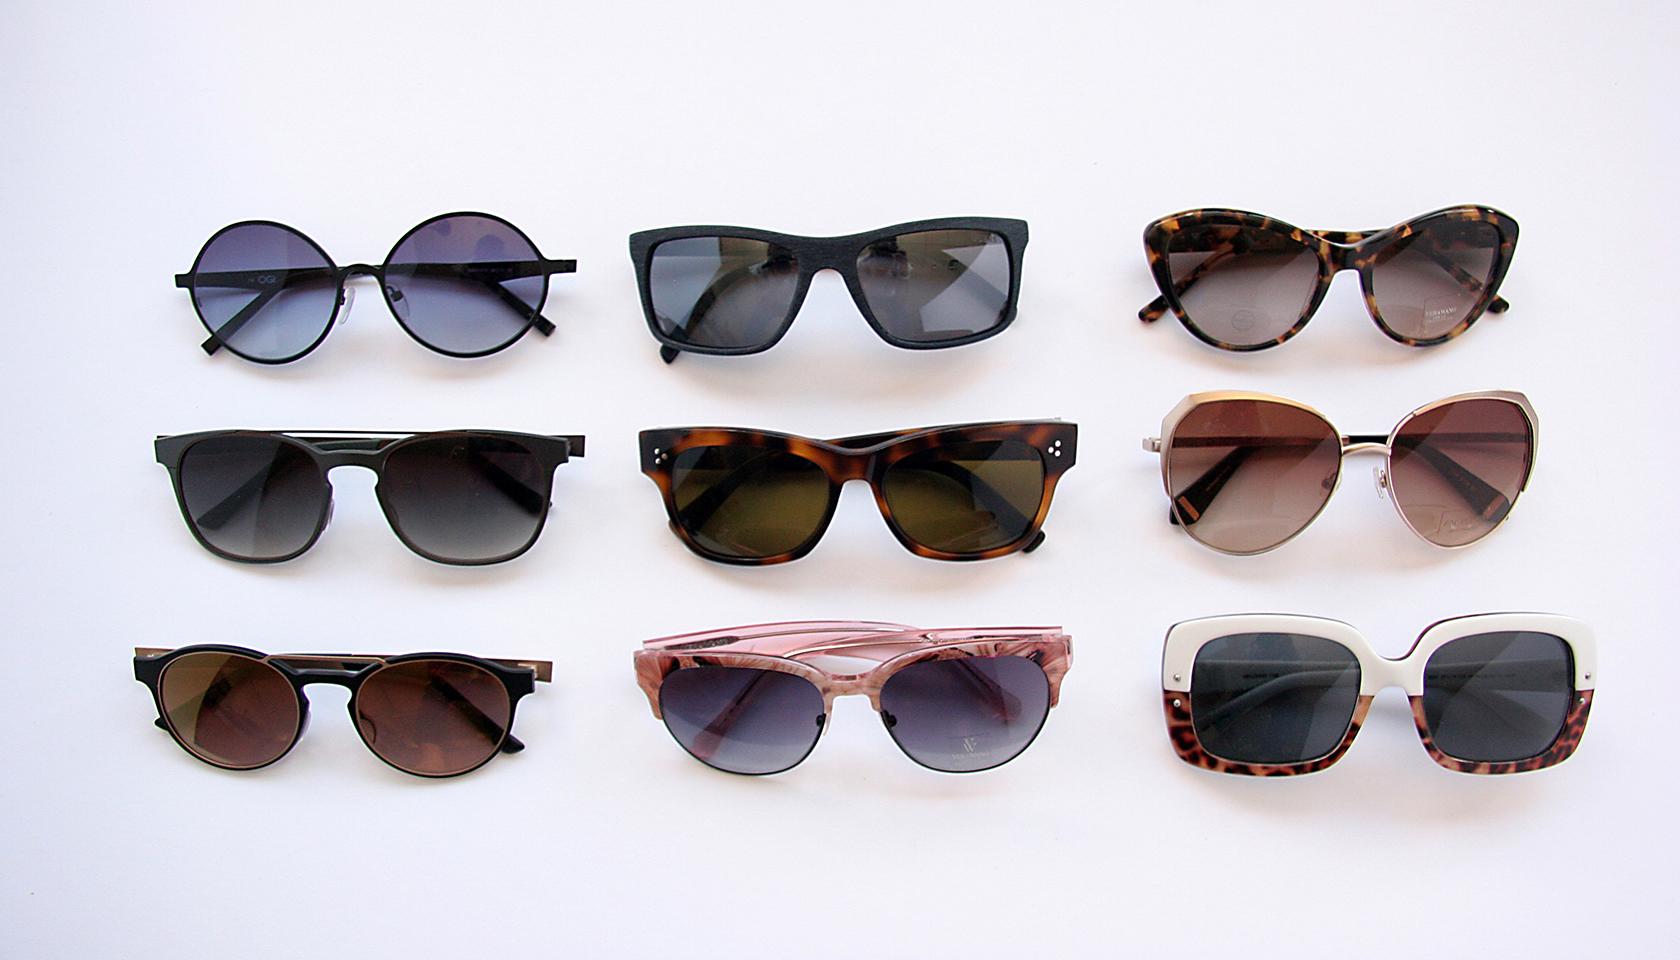 Quality fashion sunglasses at Hillcrest Optical